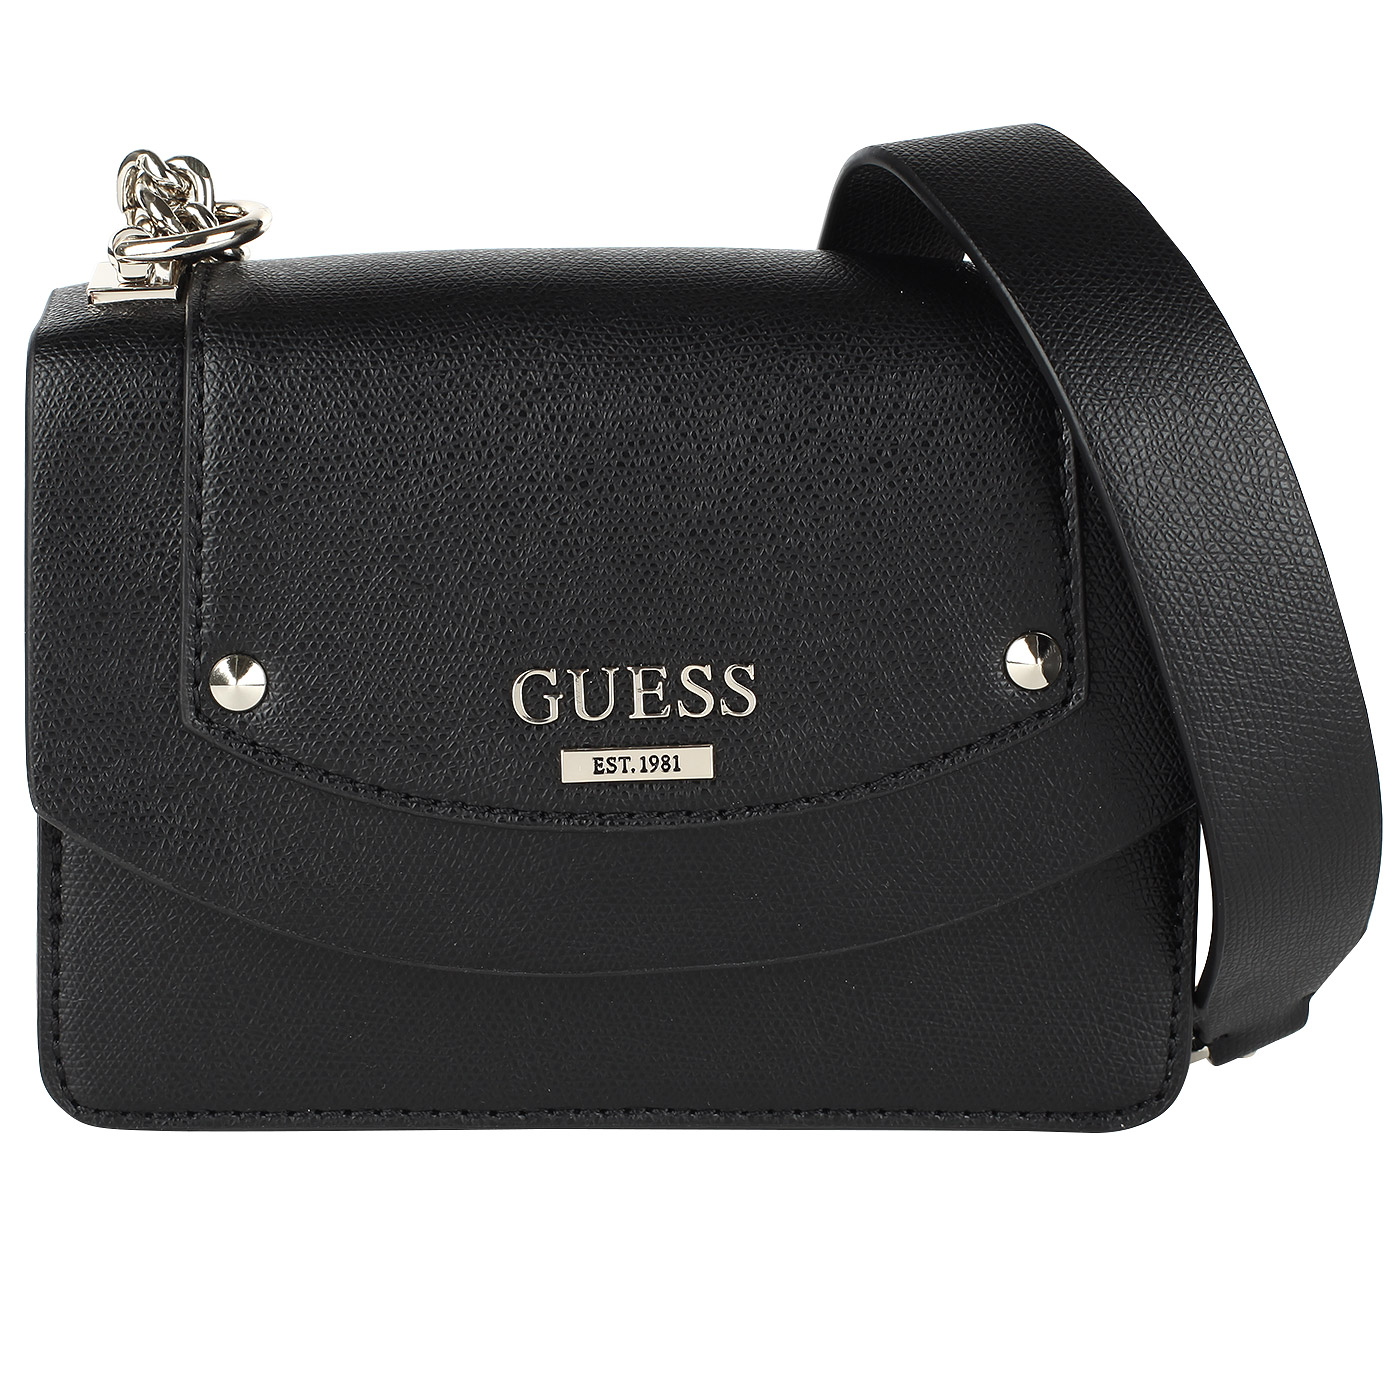 ab9df1bef1d6 ... Маленькая черная сумочка на цепочке через плечо Guess Cool Mix ...